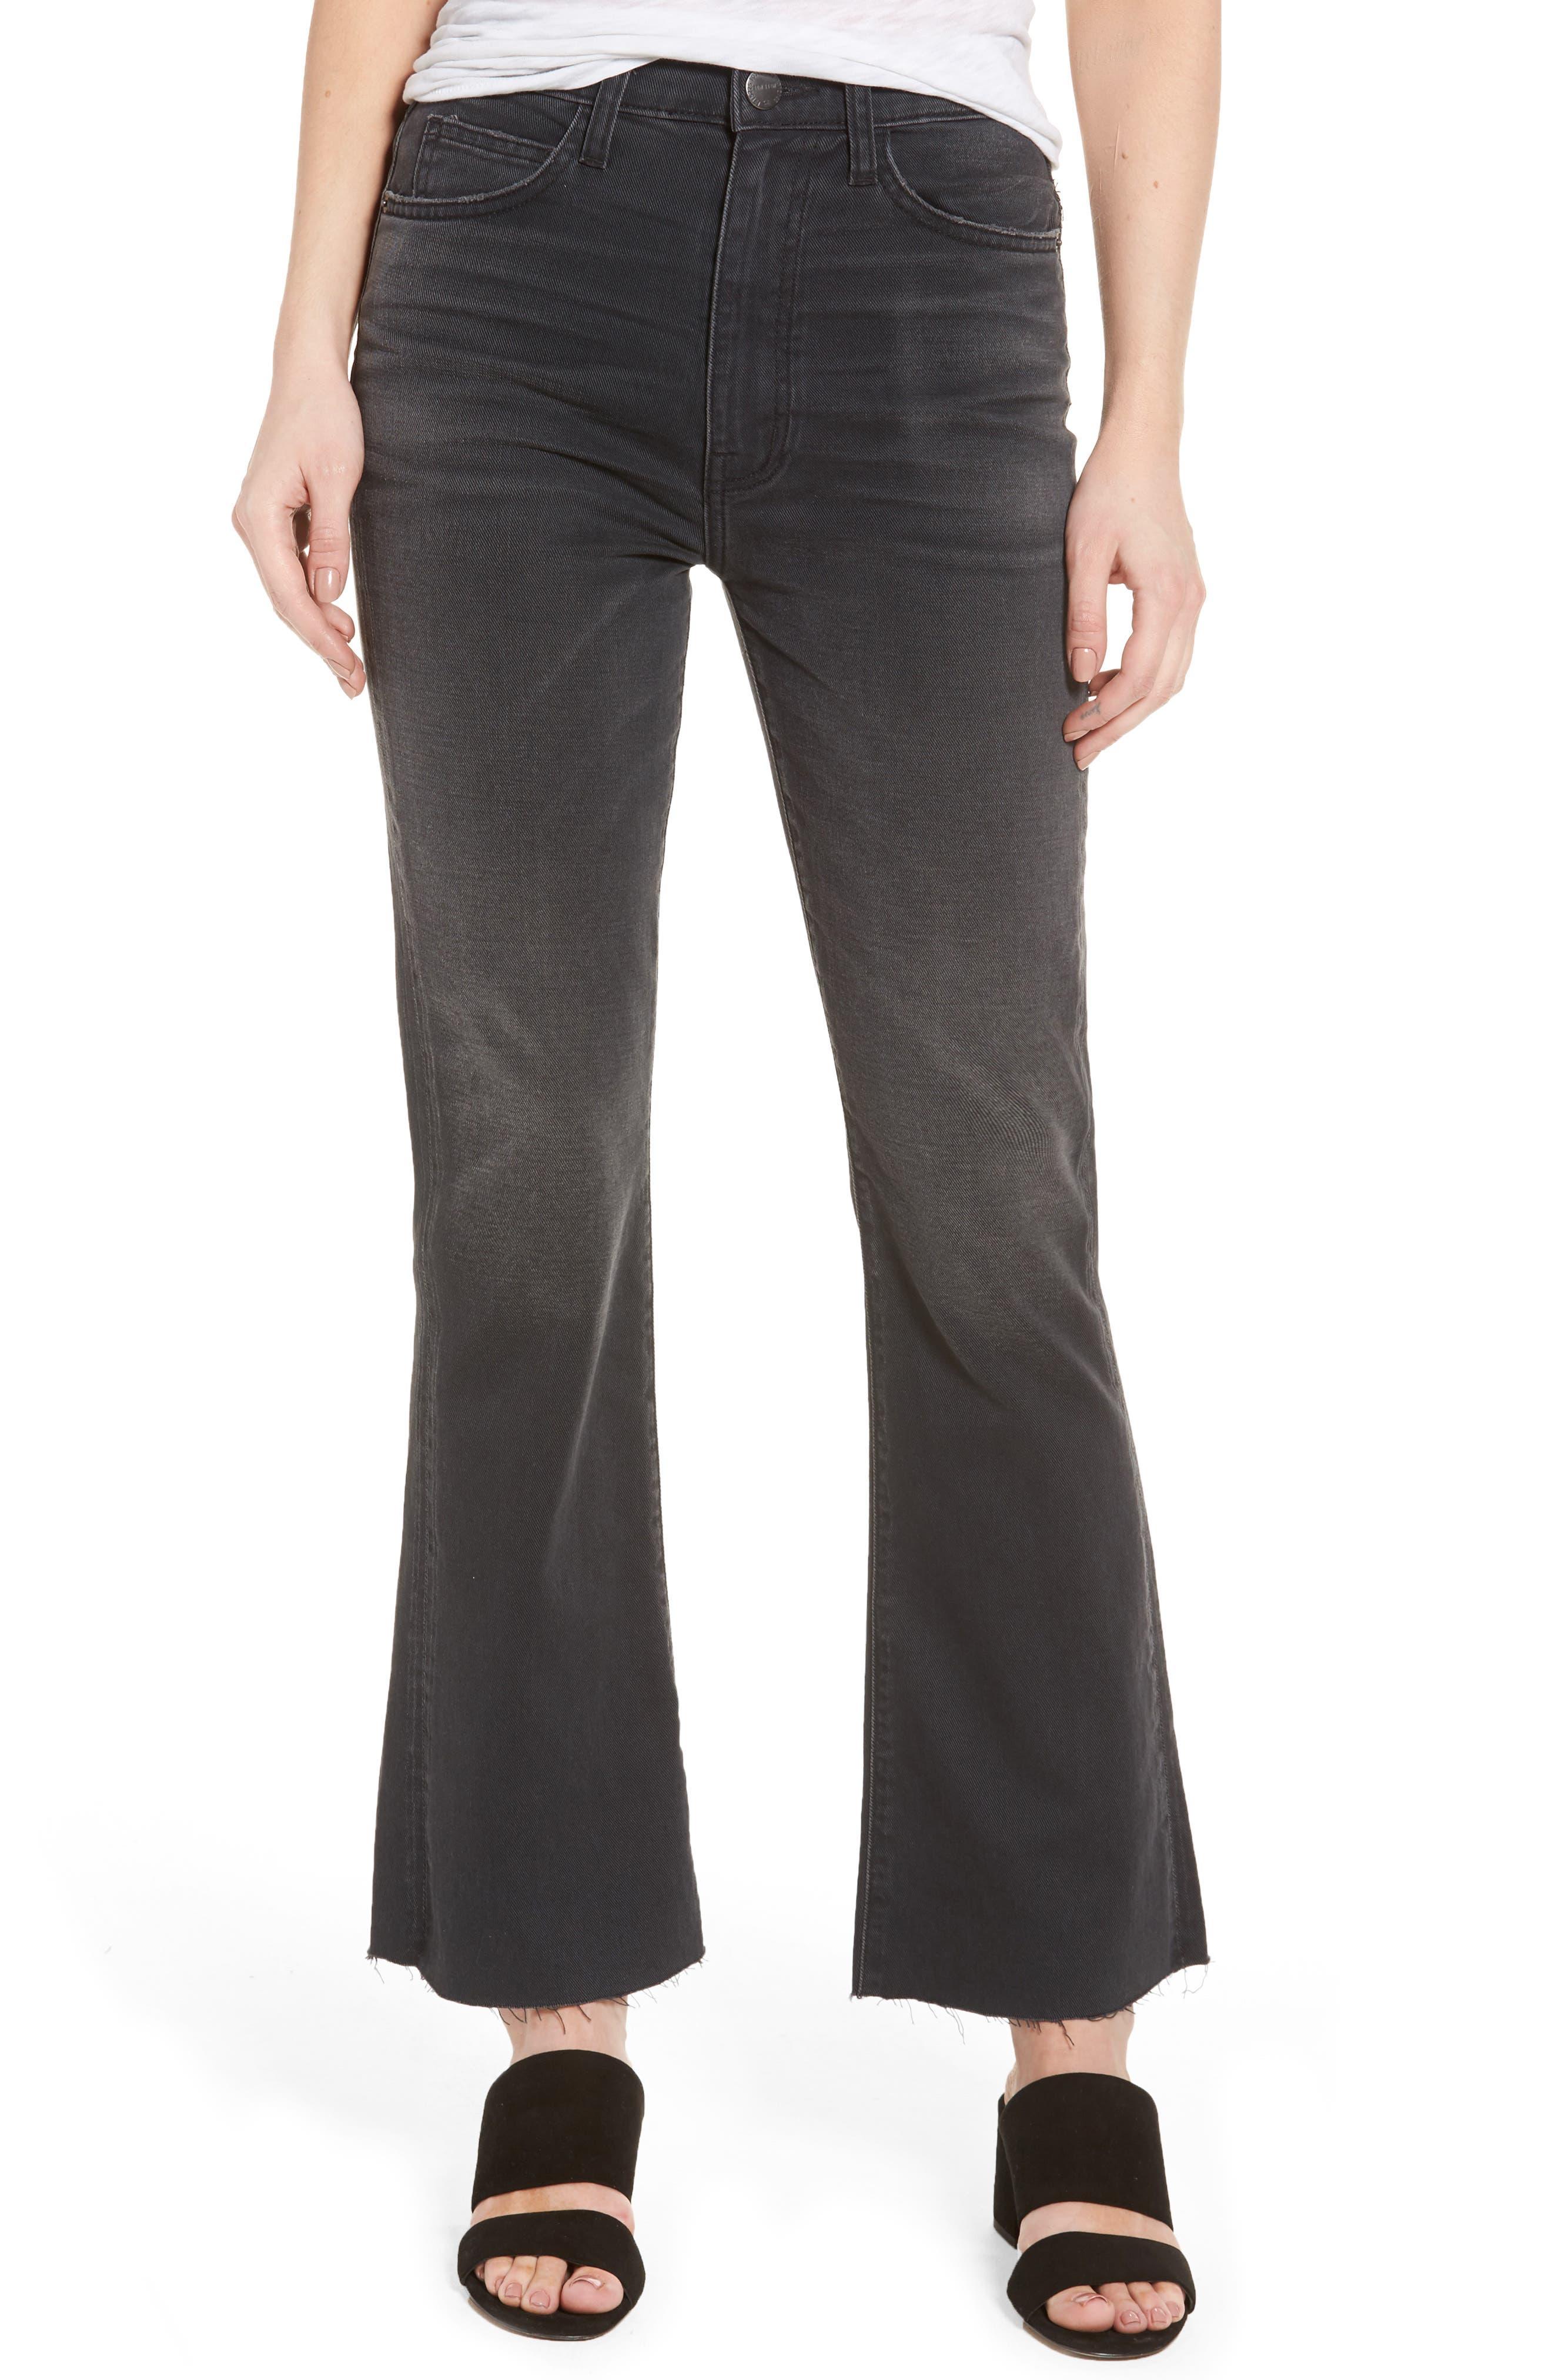 The Kick High Waist Crop Flare Jeans,                             Main thumbnail 1, color,                             017